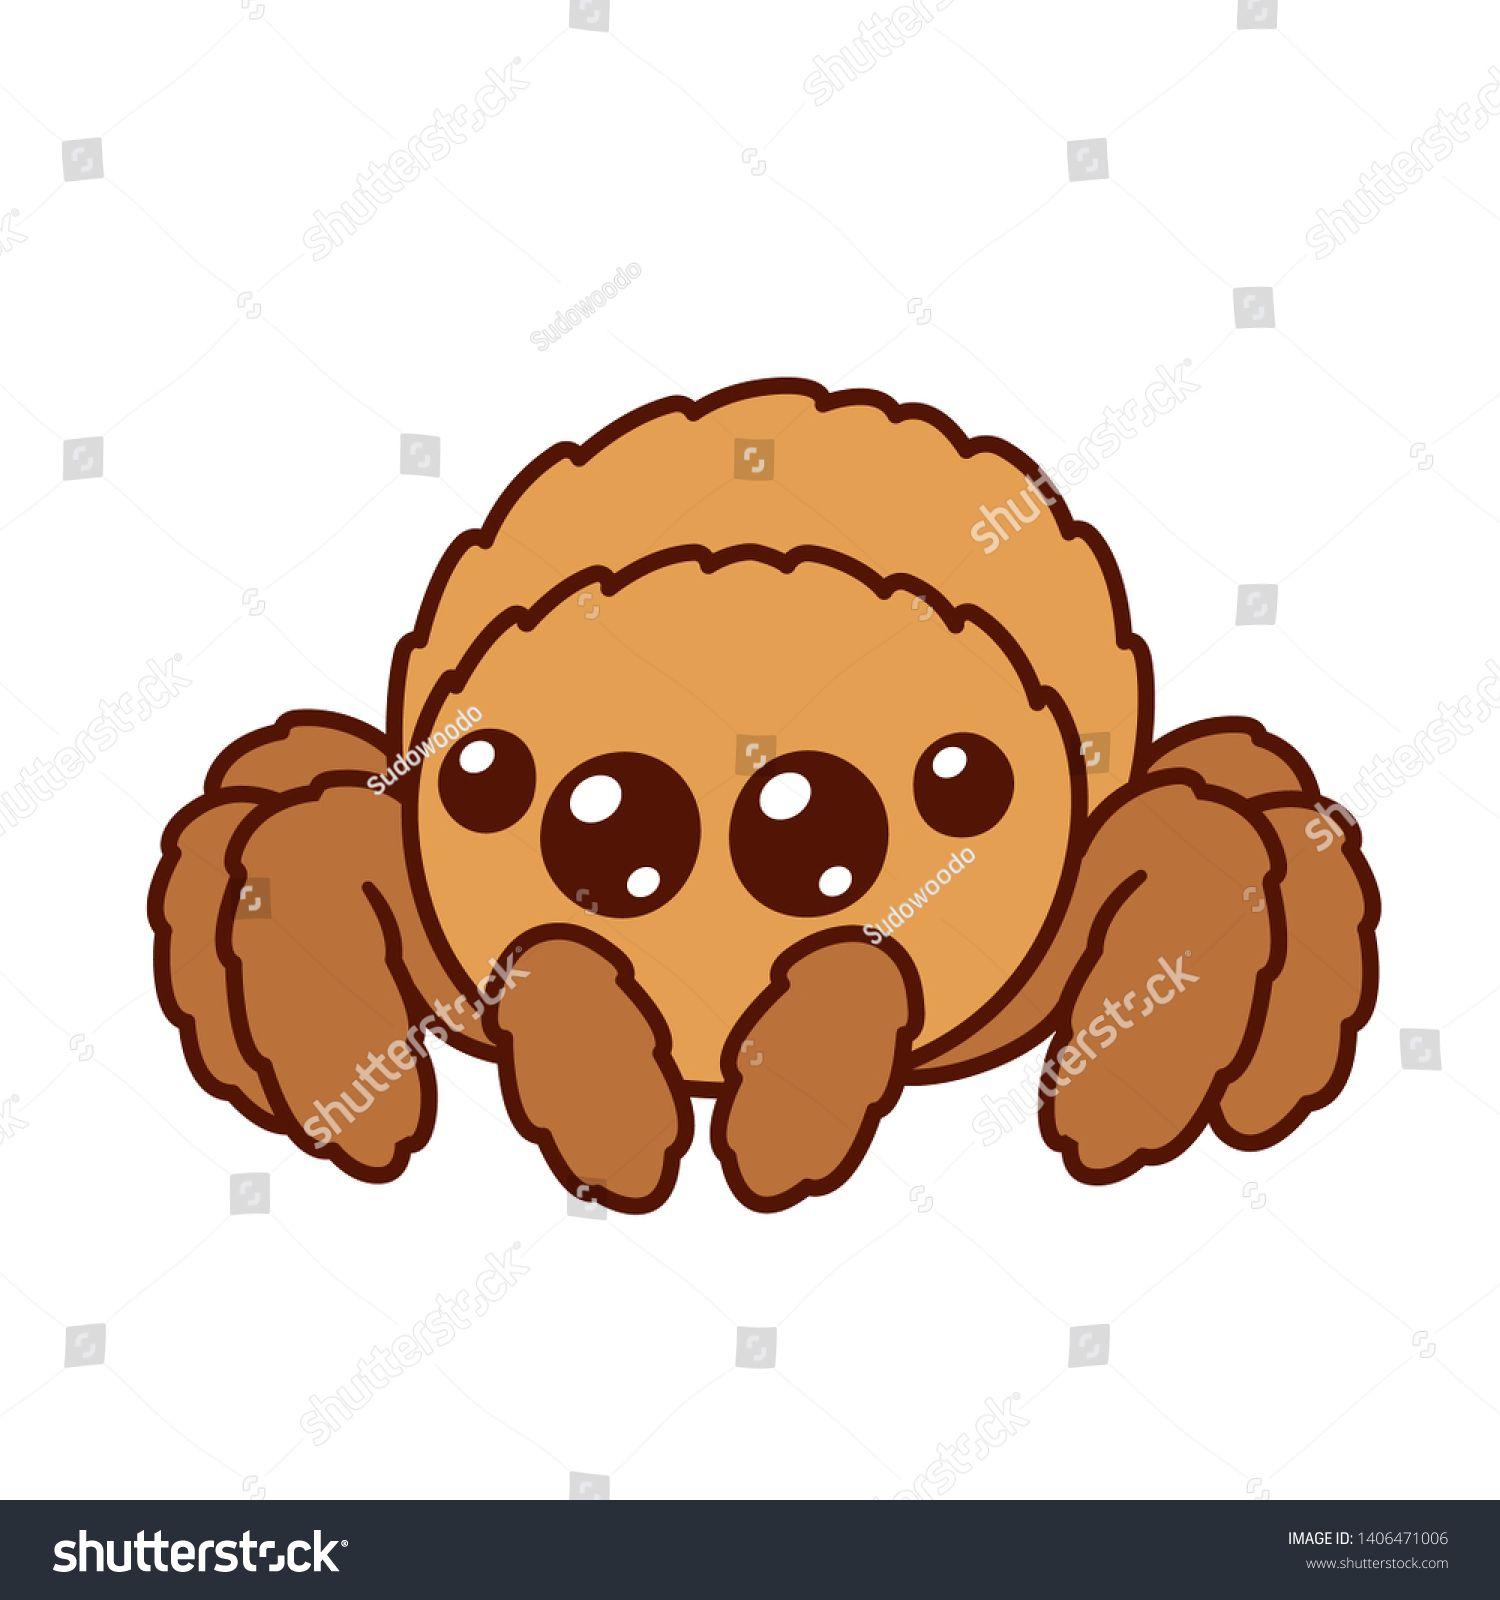 Cute Cartoon Fluffy Spider With Big Shiny Eyes Kawaii Spider Character Drawing Isolated Vector Illustration Ad Spider Drawing Kawaii Spider Spider Cartoon